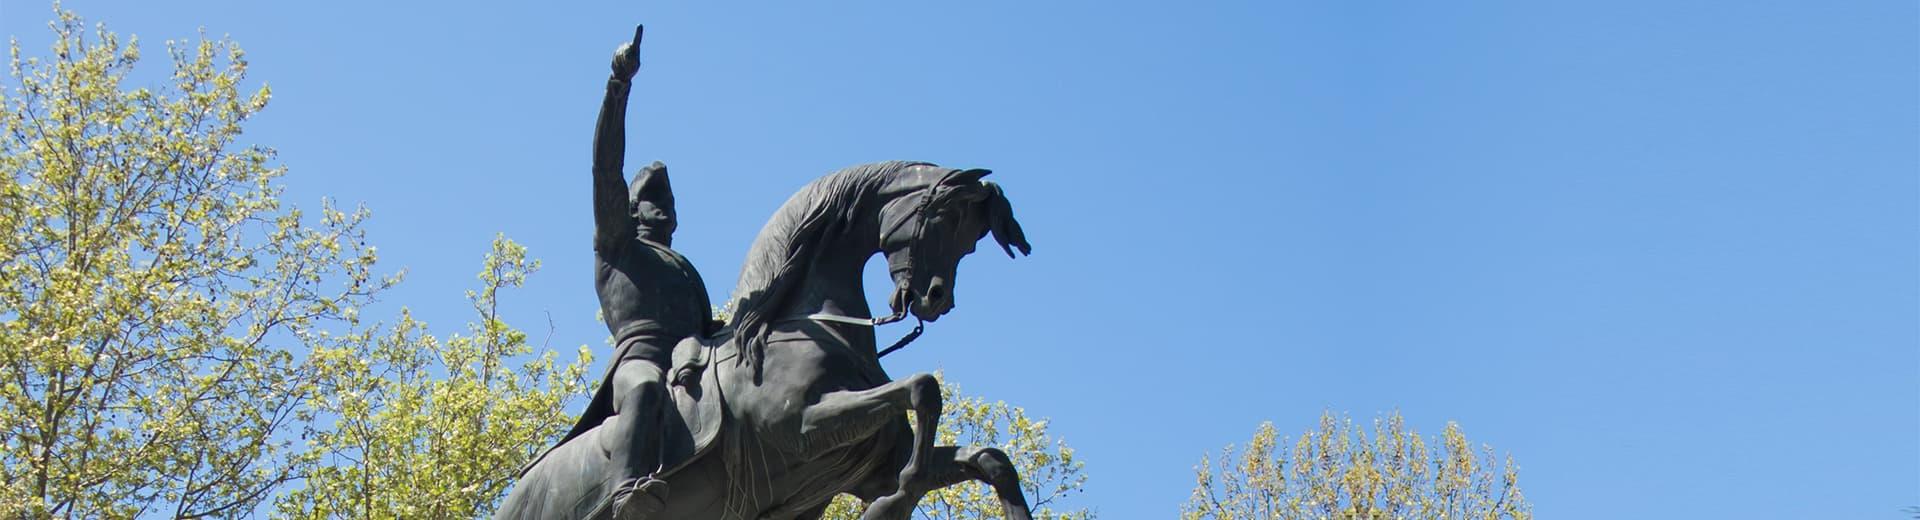 San Martín: héroe para armar